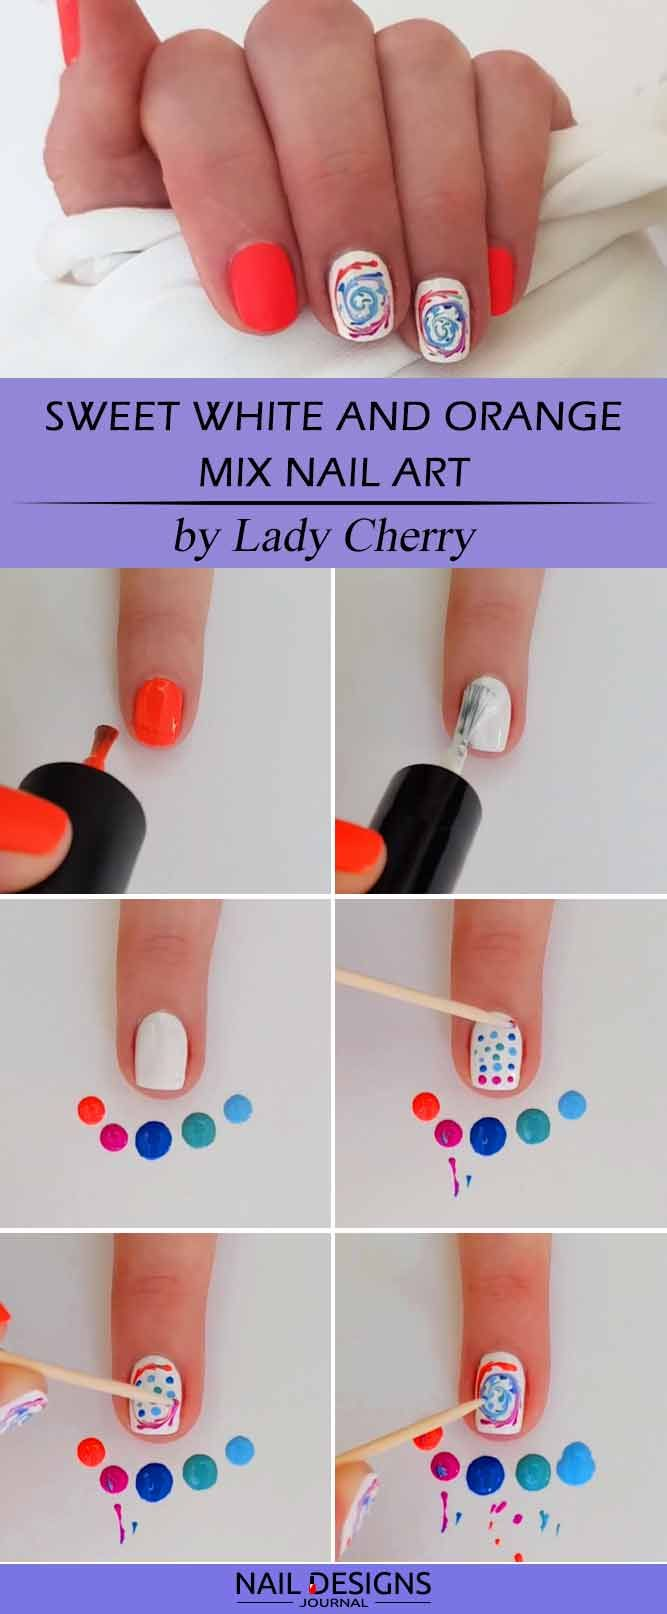 20 Super Easy Nail Designs Diy Tutorials Nail Designs Easy Diy Simple Nail Designs Diy Nail Designs